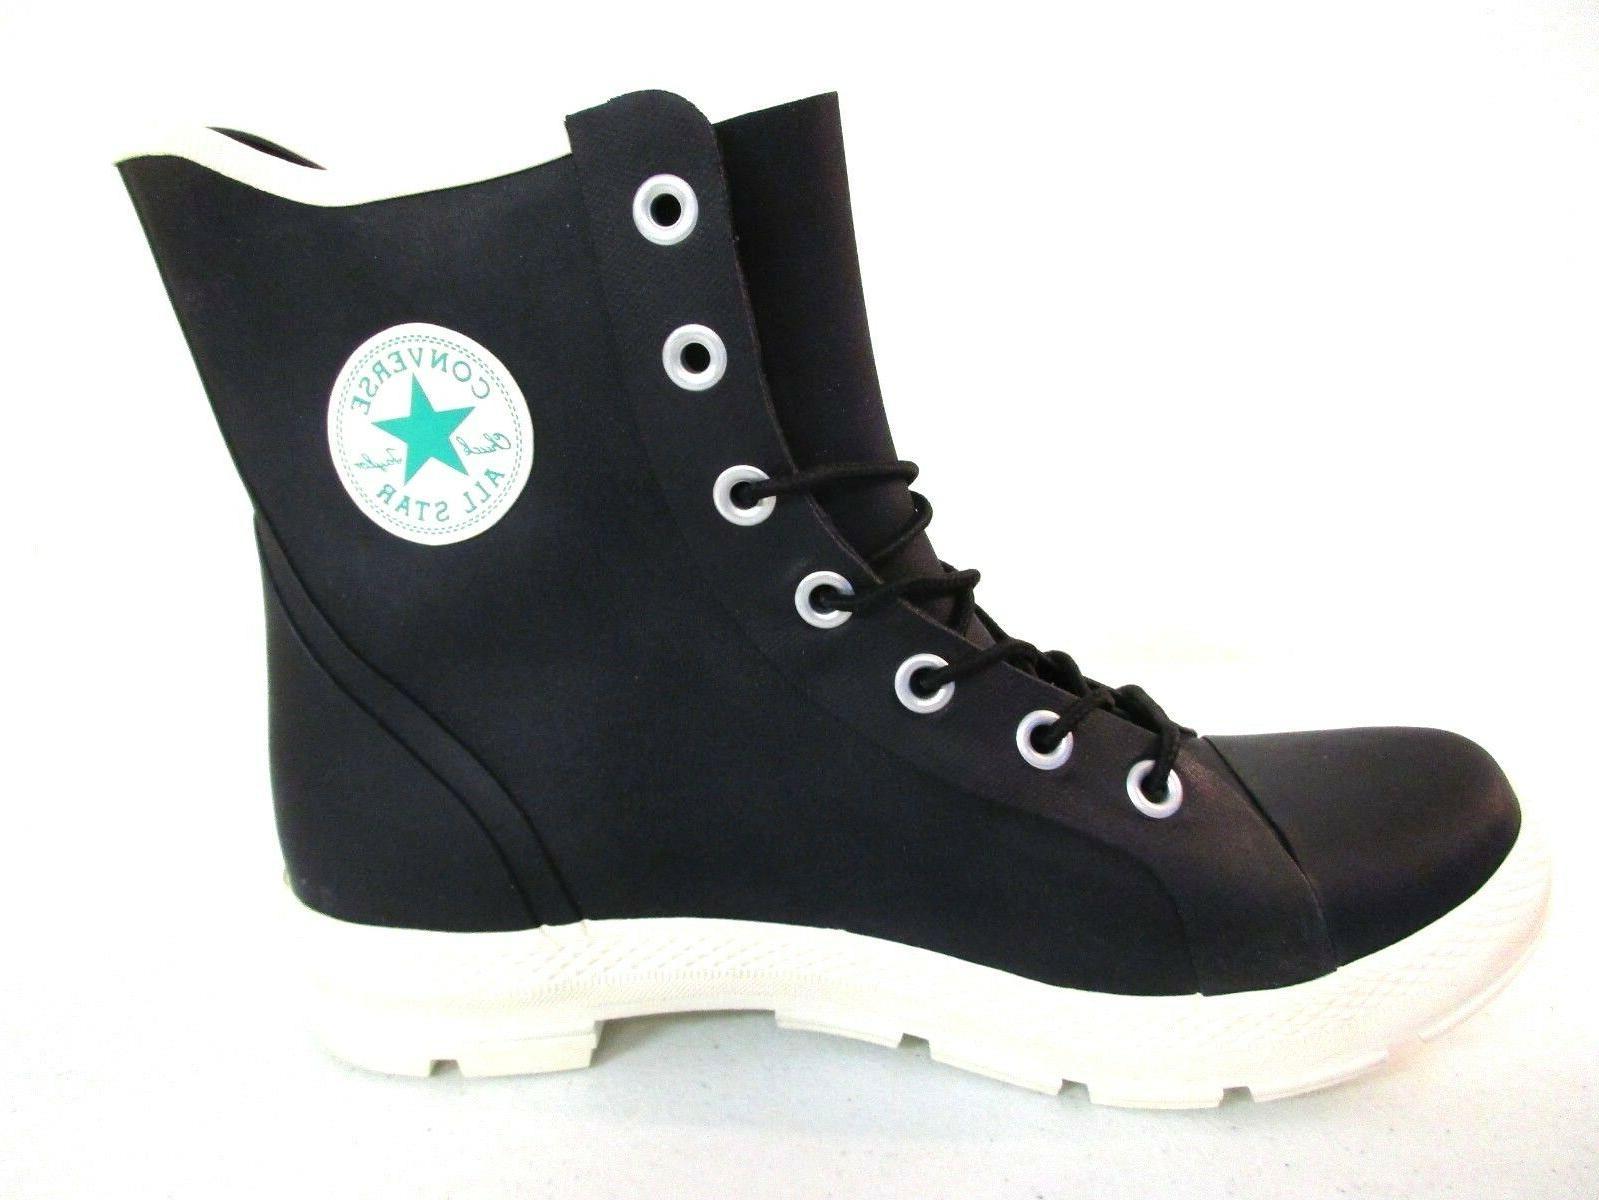 Converse CT Outsider Boot HI Black 11153 Size 12 MEN 5925